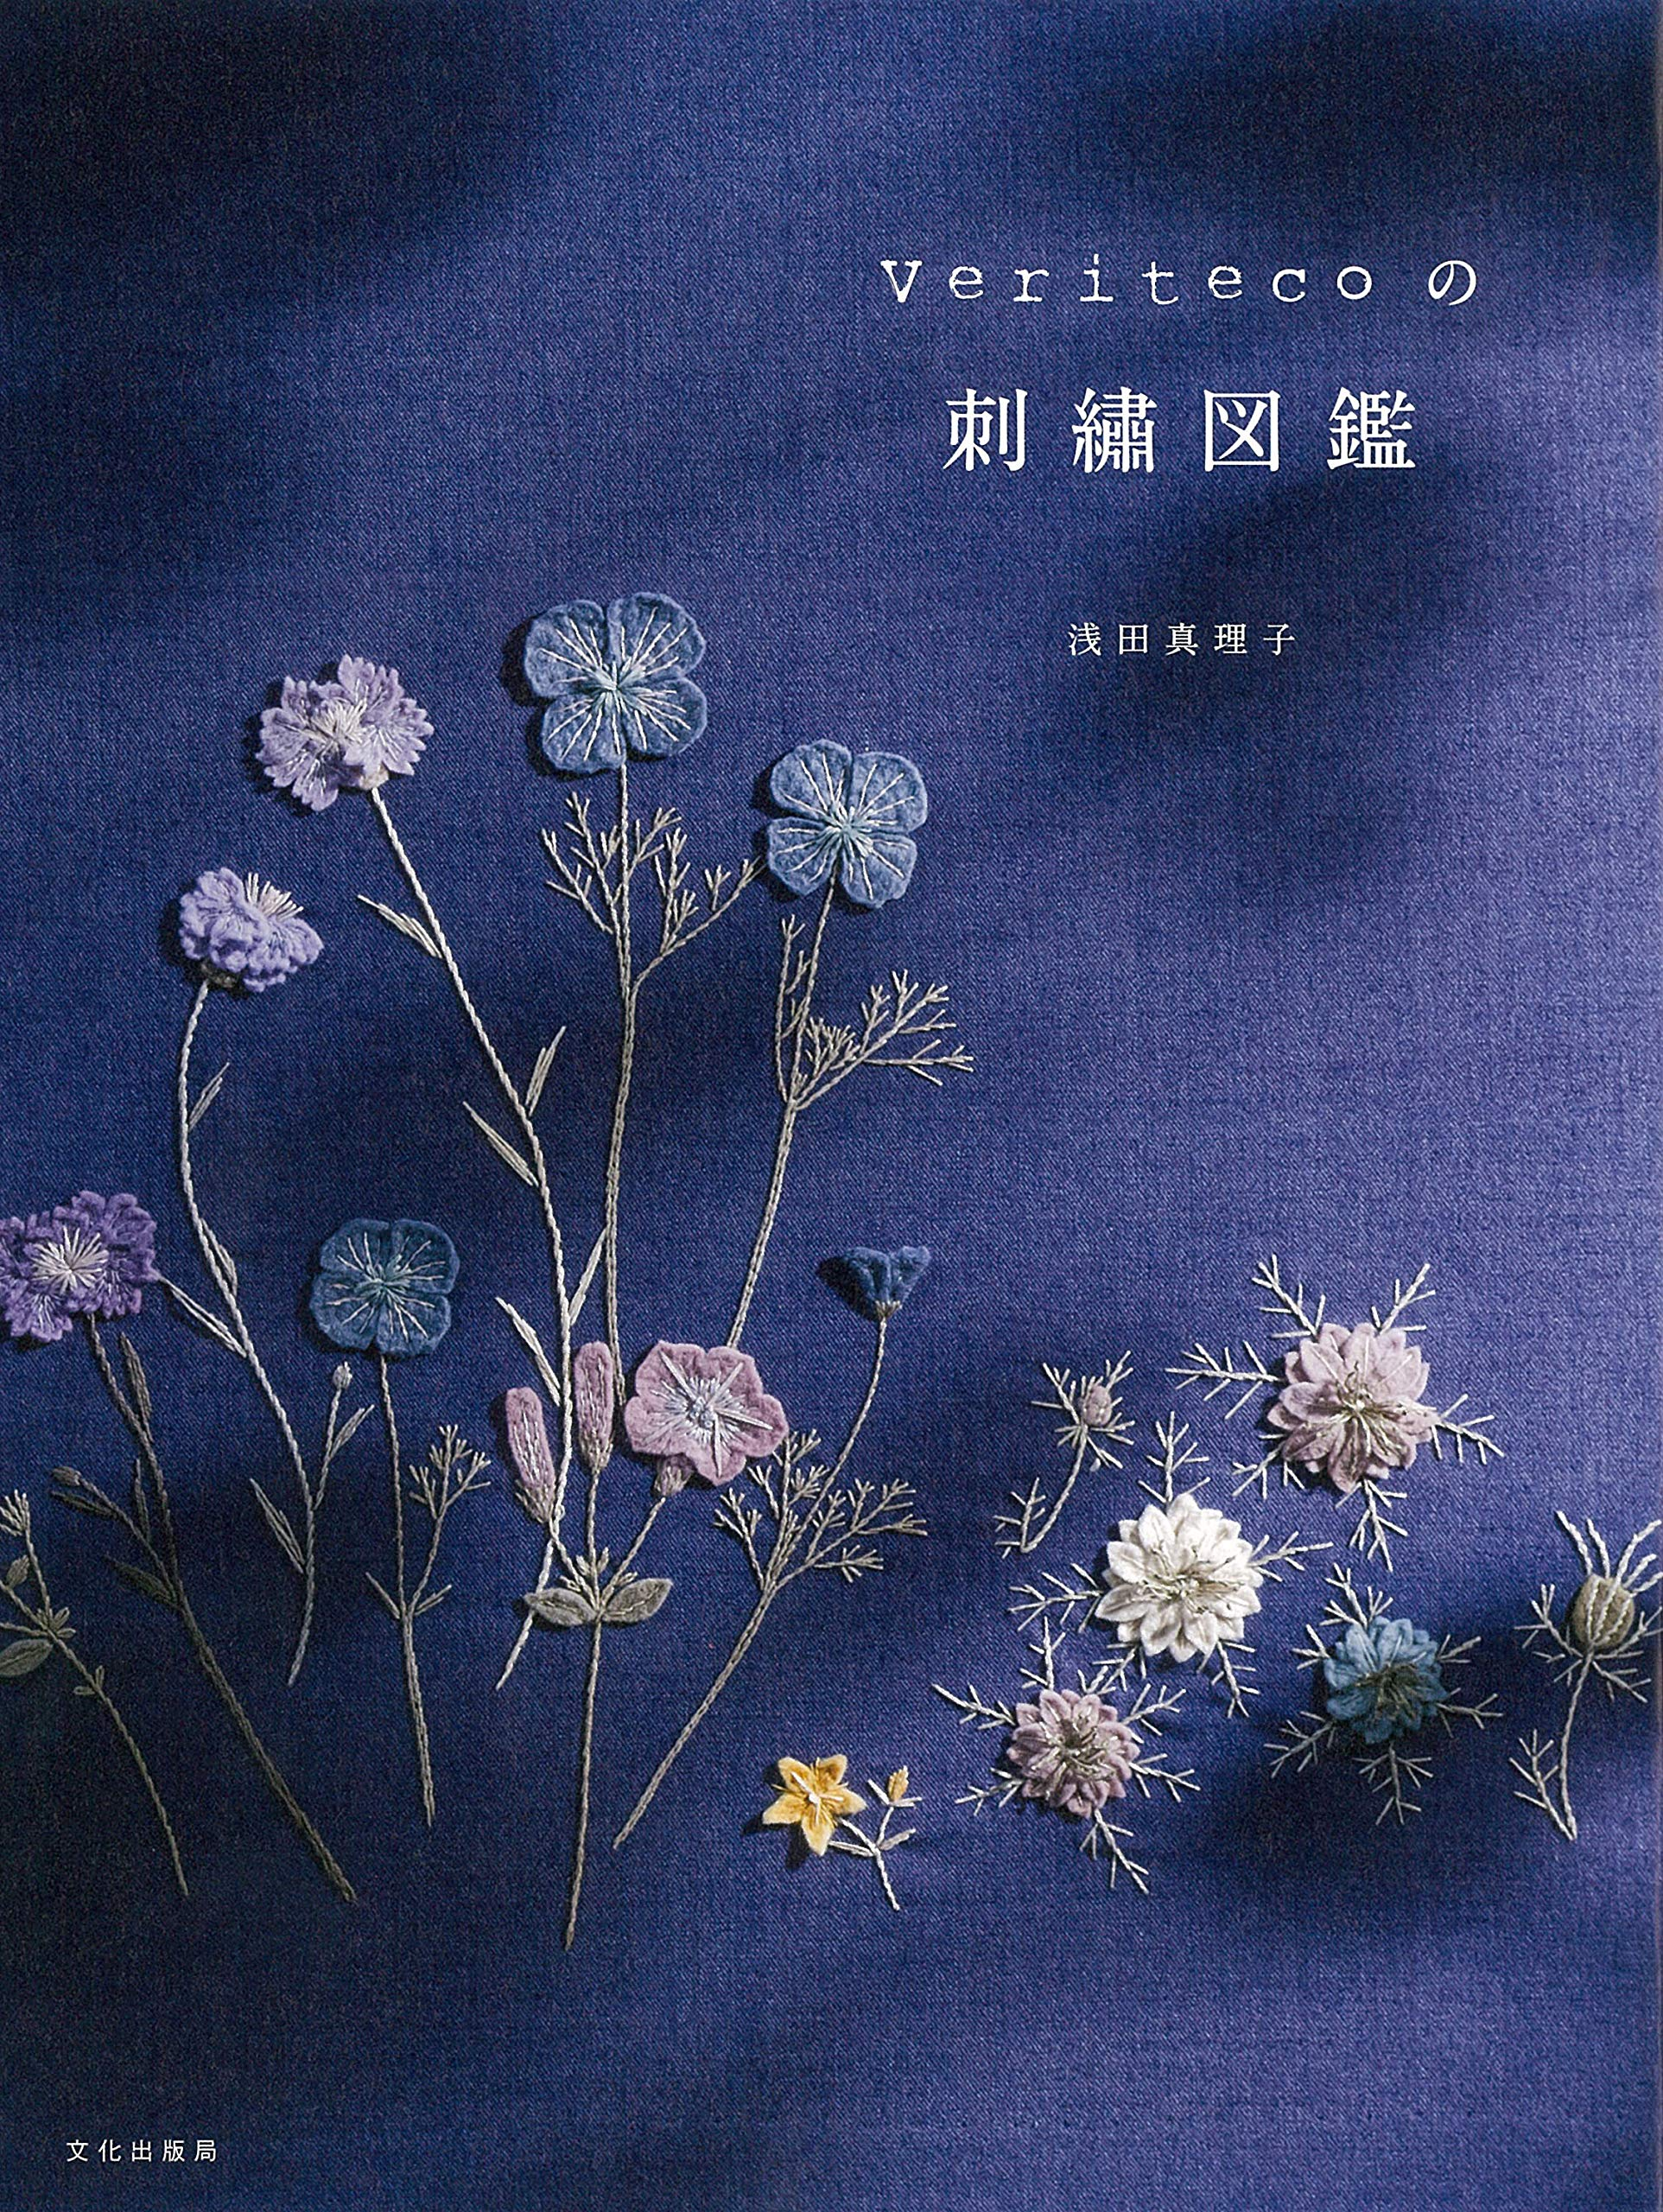 Veriteco Embroidery Exhibition Book